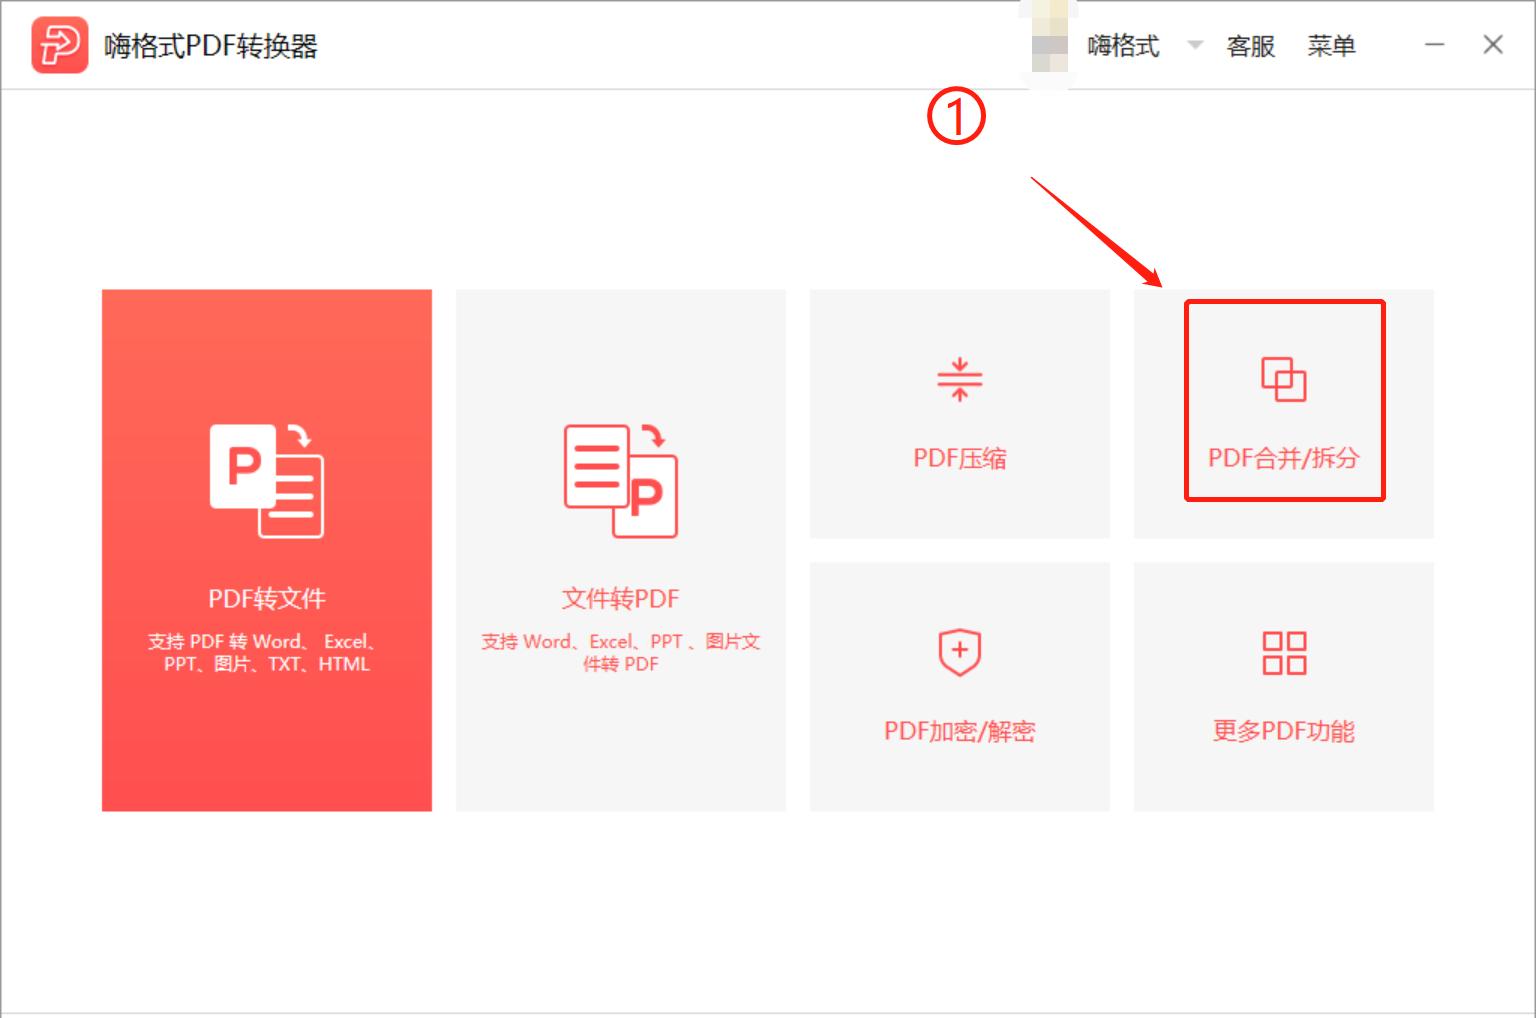 PDF拆分教程